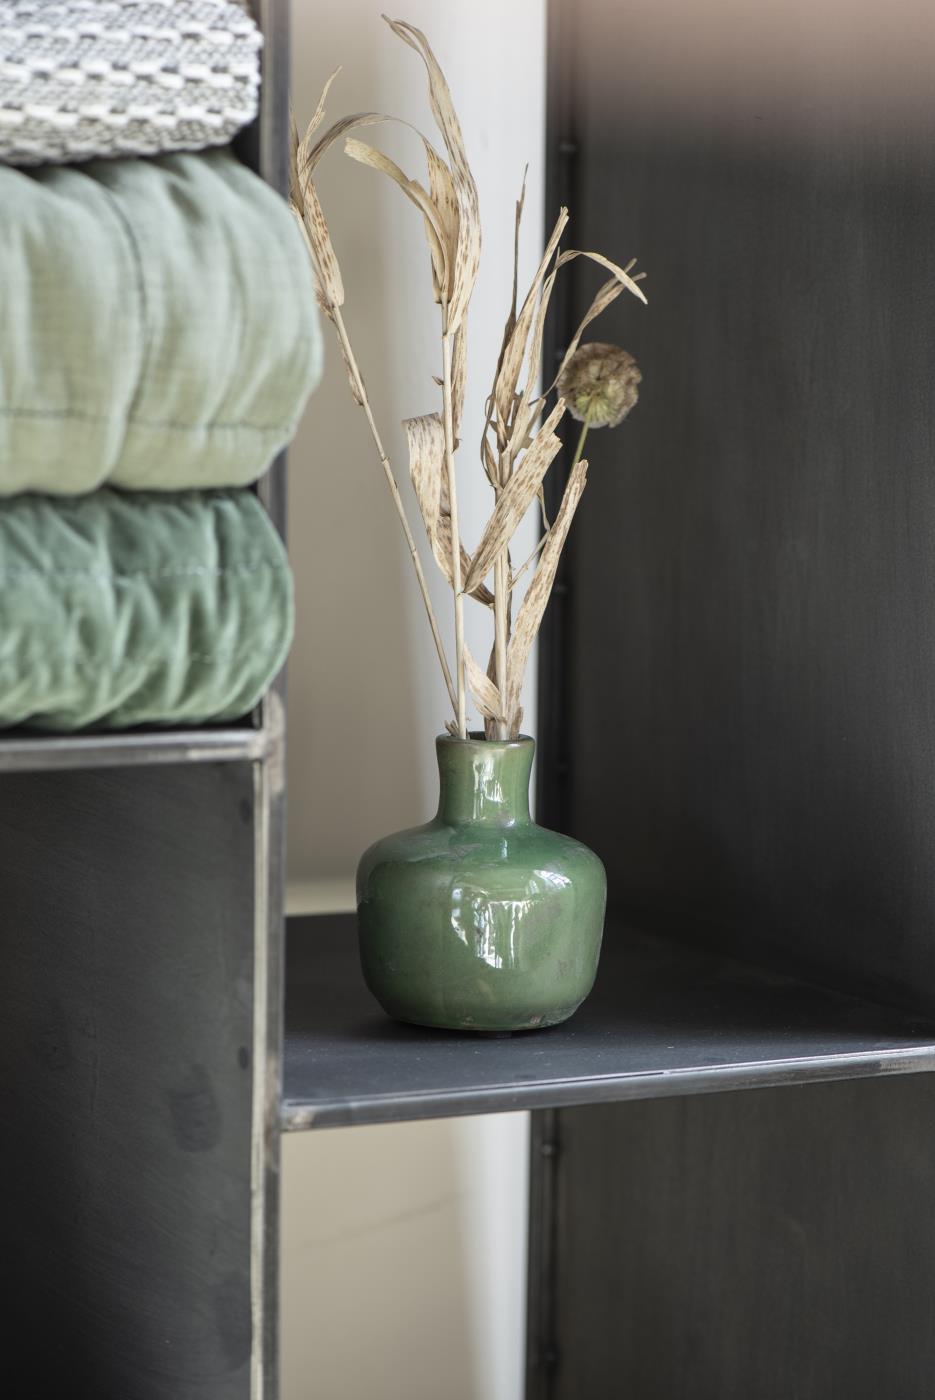 IB Laursen Vasen, Bild 1